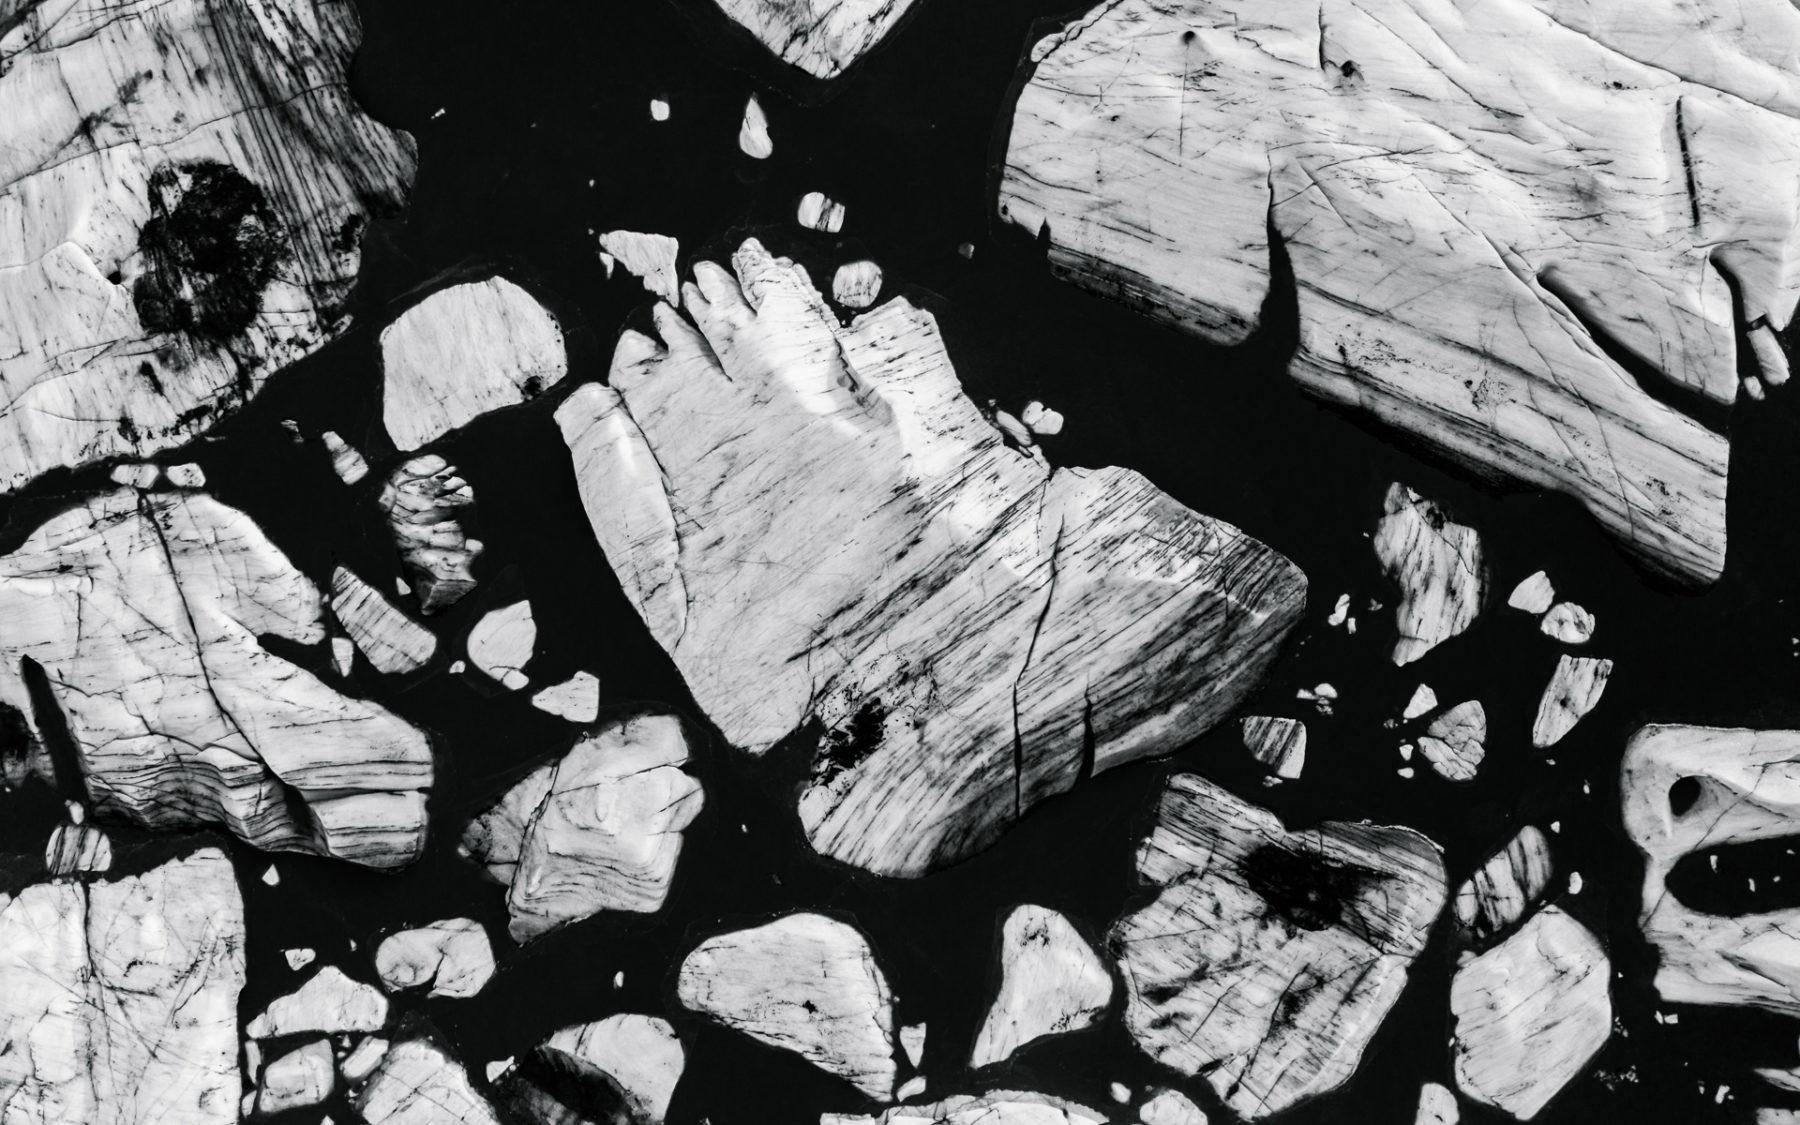 nls 2001 norway iceland portraits of glaciers 14